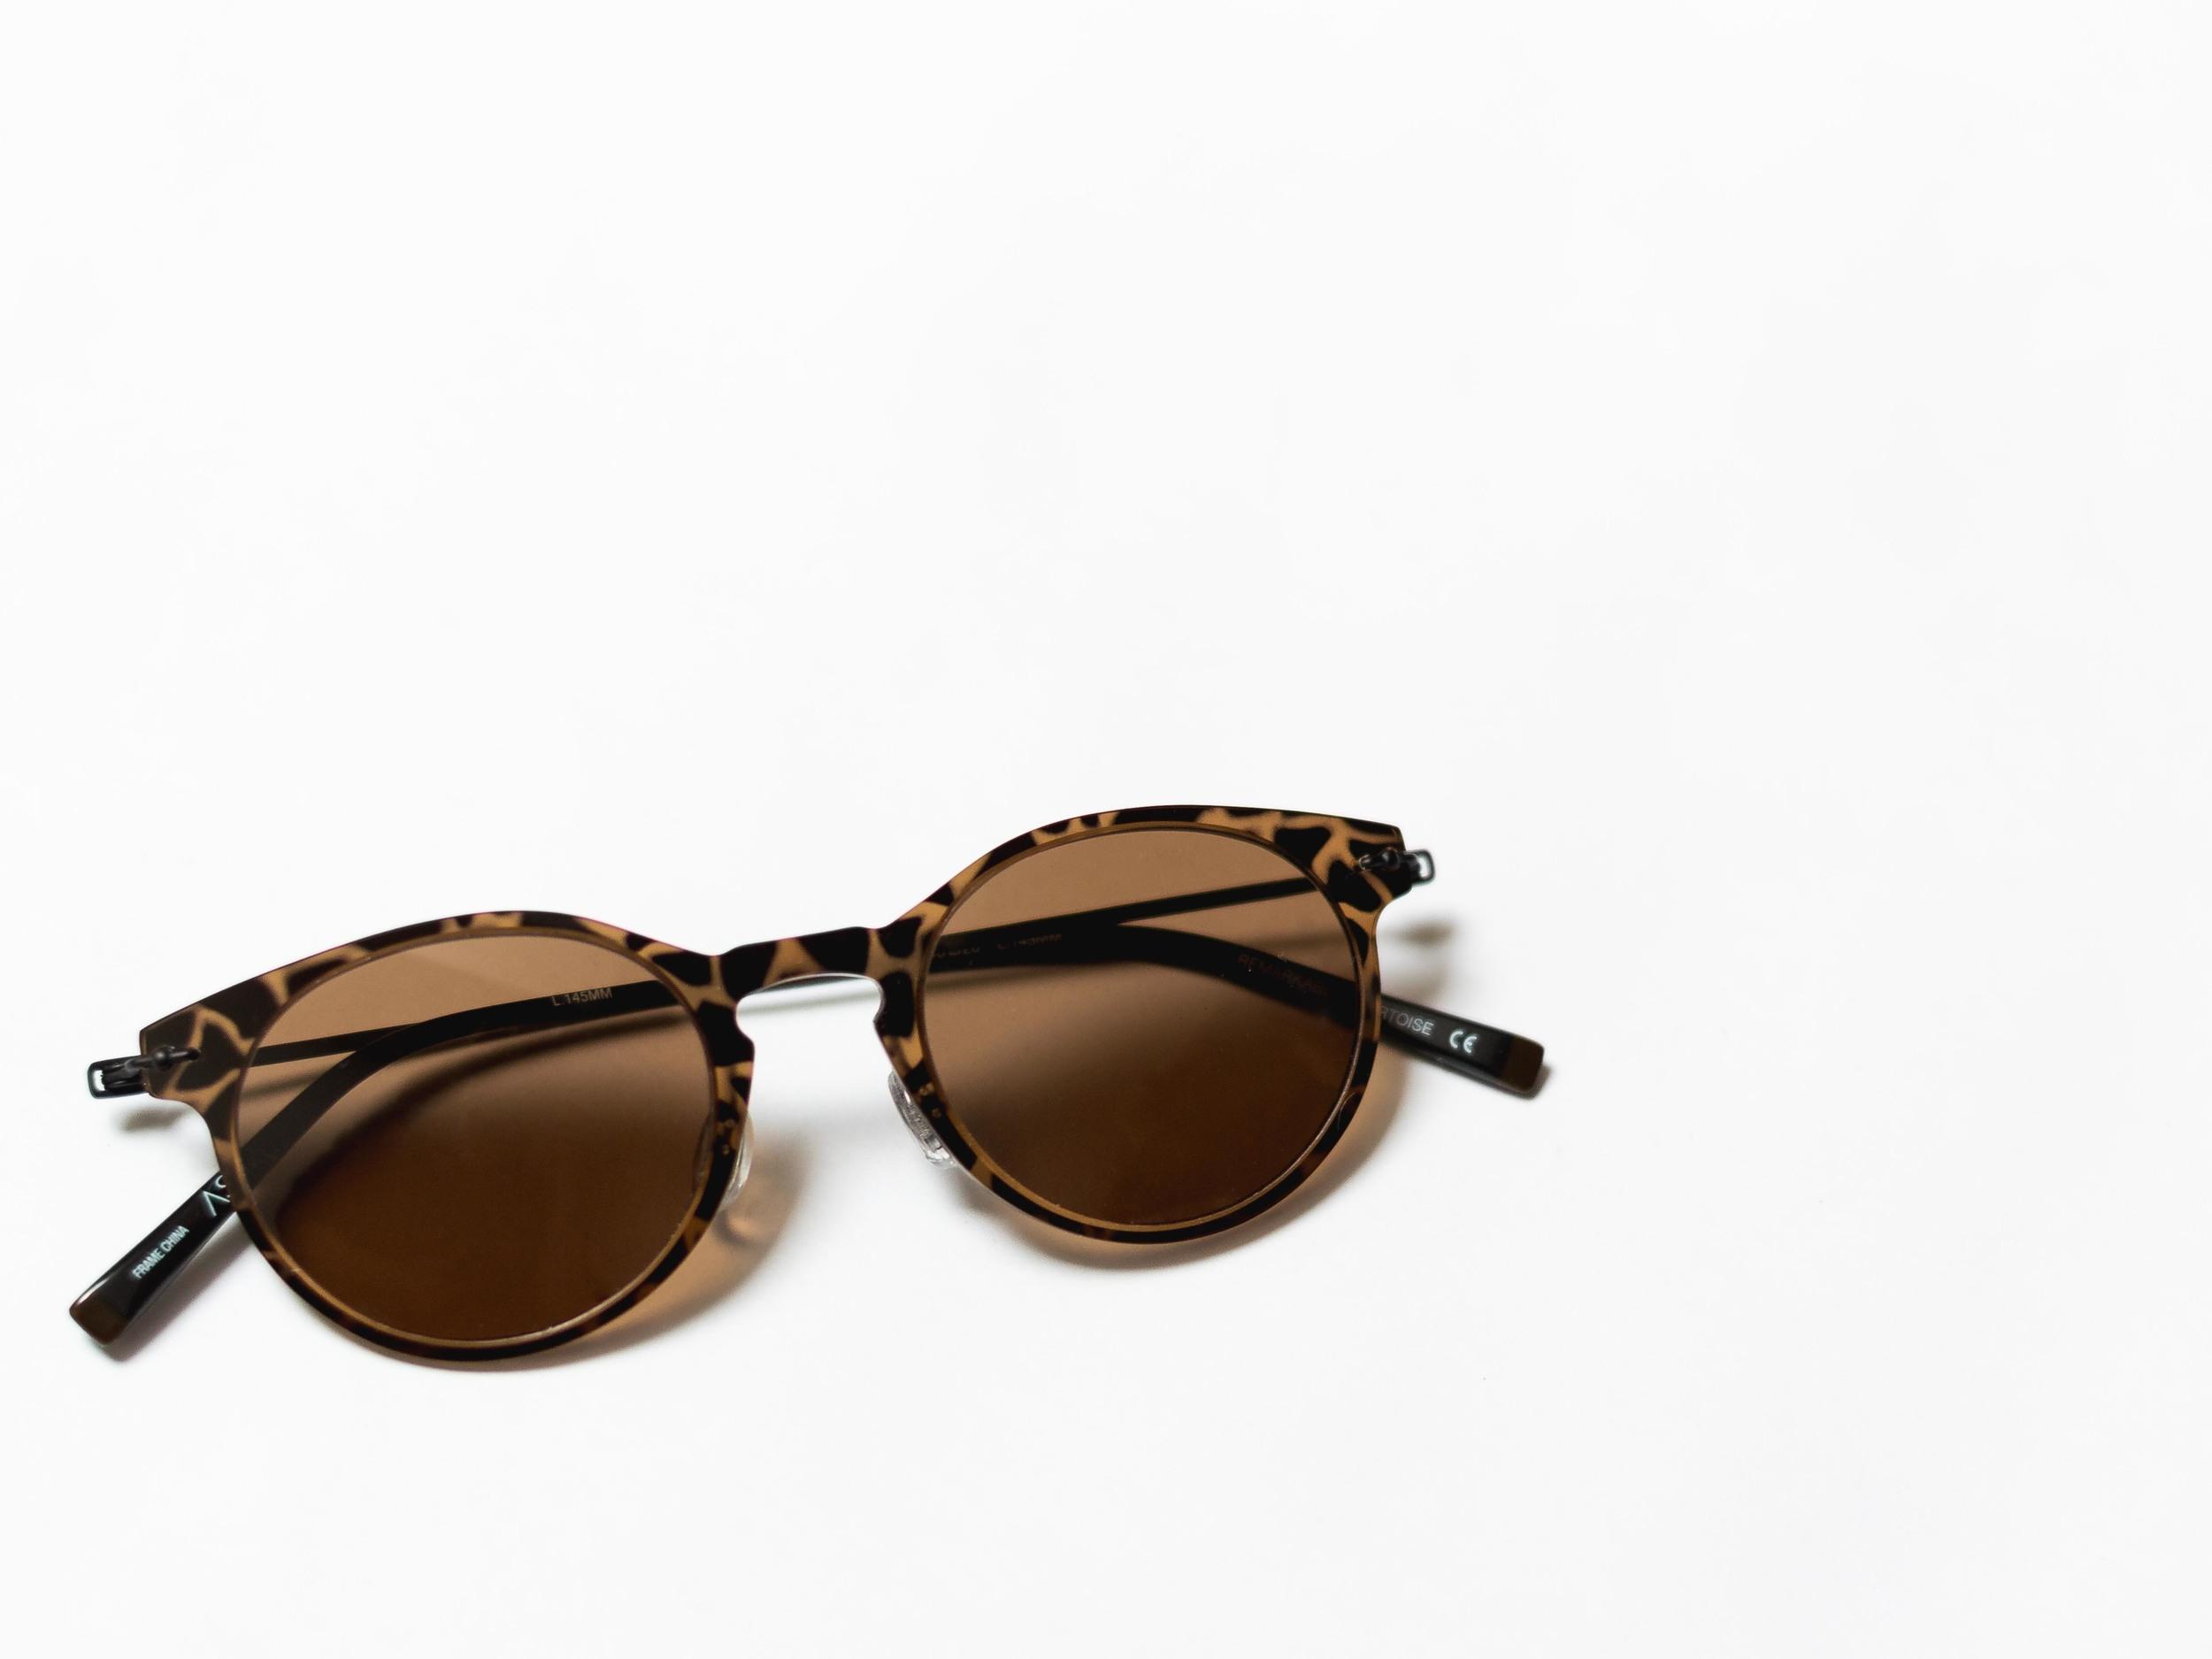 aspire eyewear review